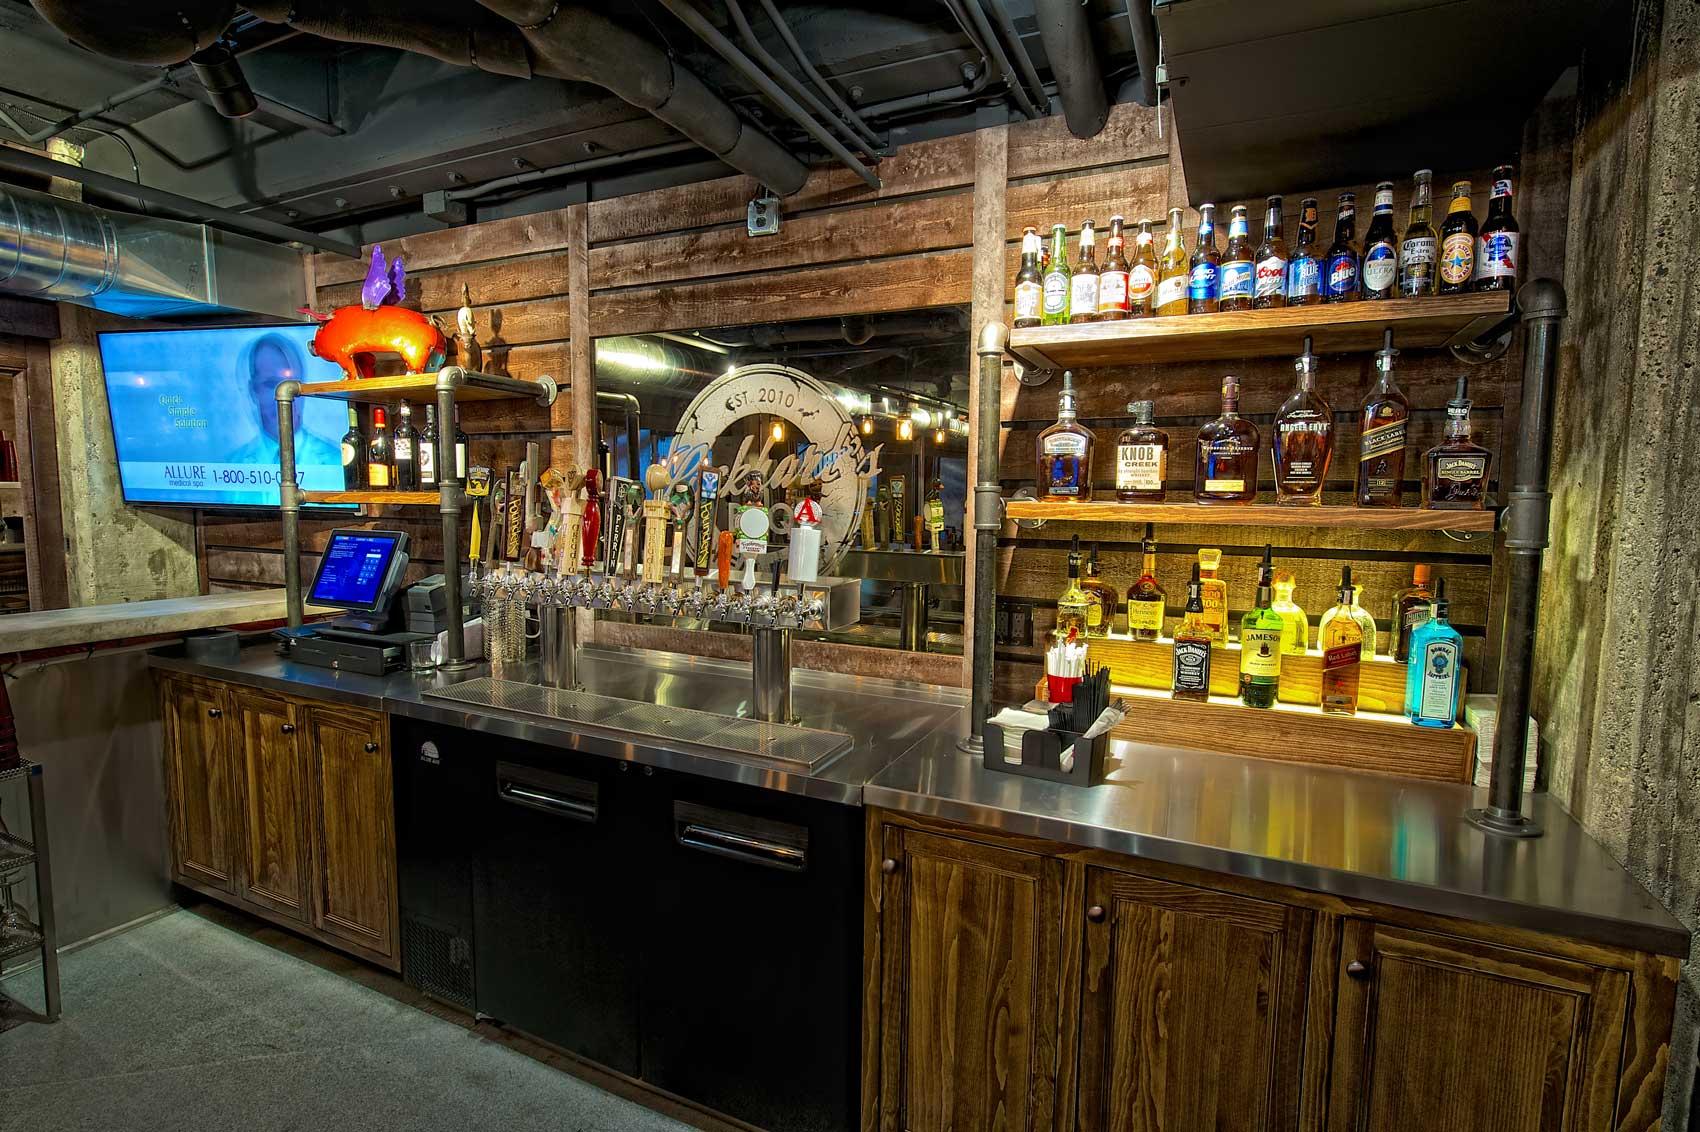 Lockhart's BBQ behind the bar details